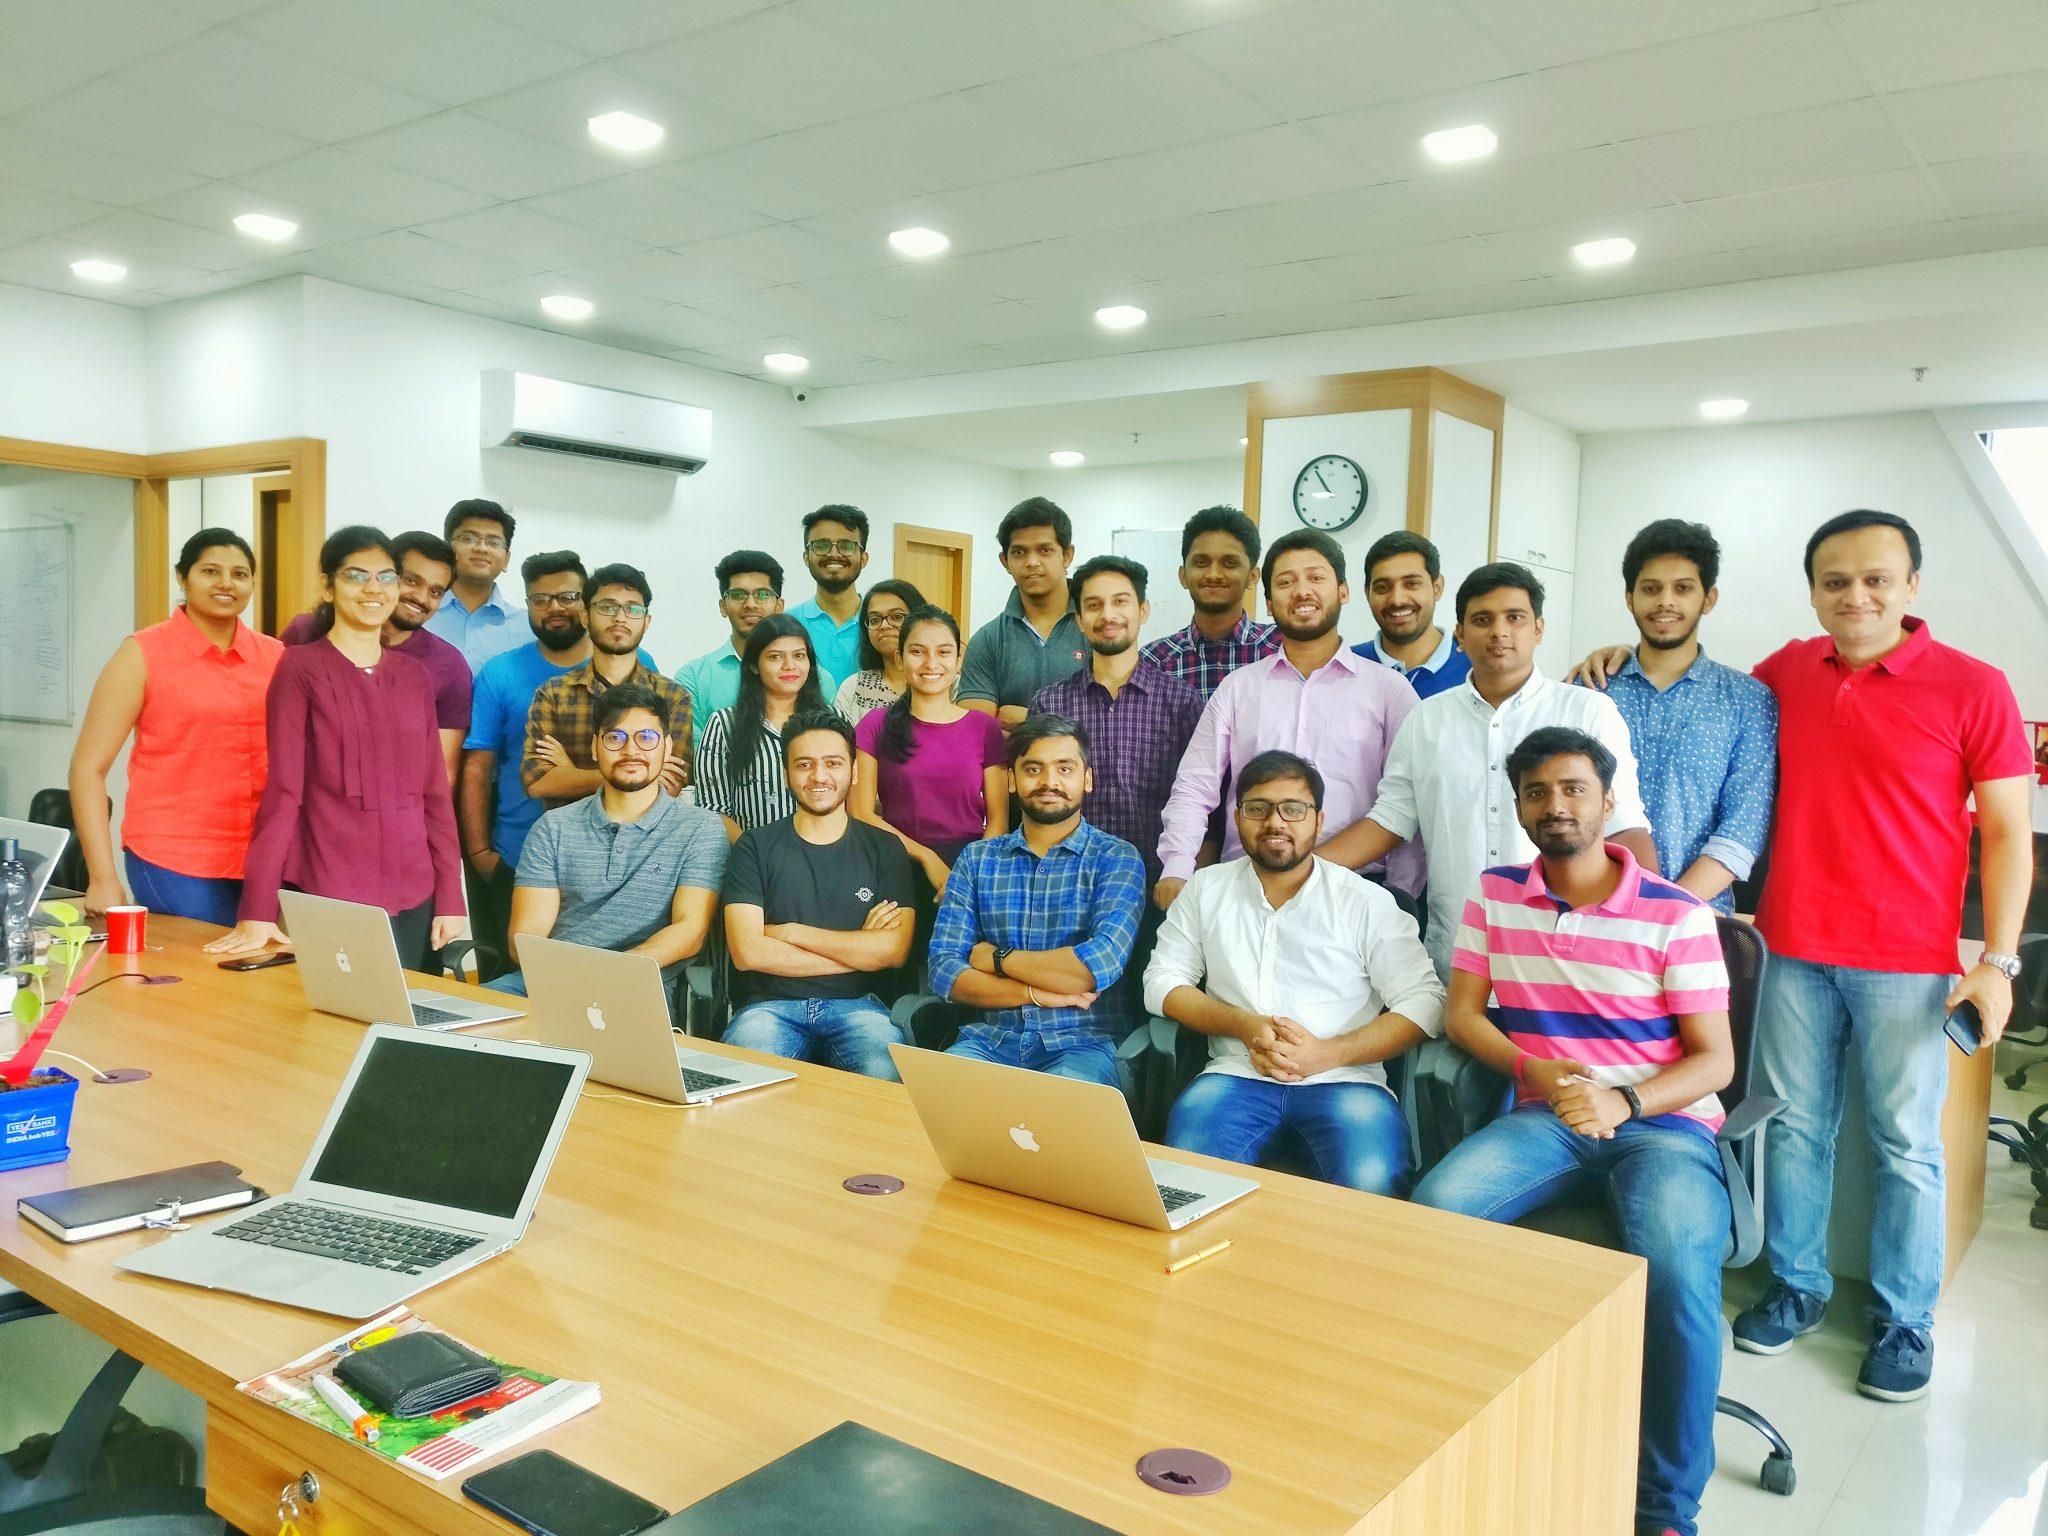 BI Startup vPhrase Analytics Raises $2 Million In Series A Funding From Falcon Edge & Bharat Innovation Fund